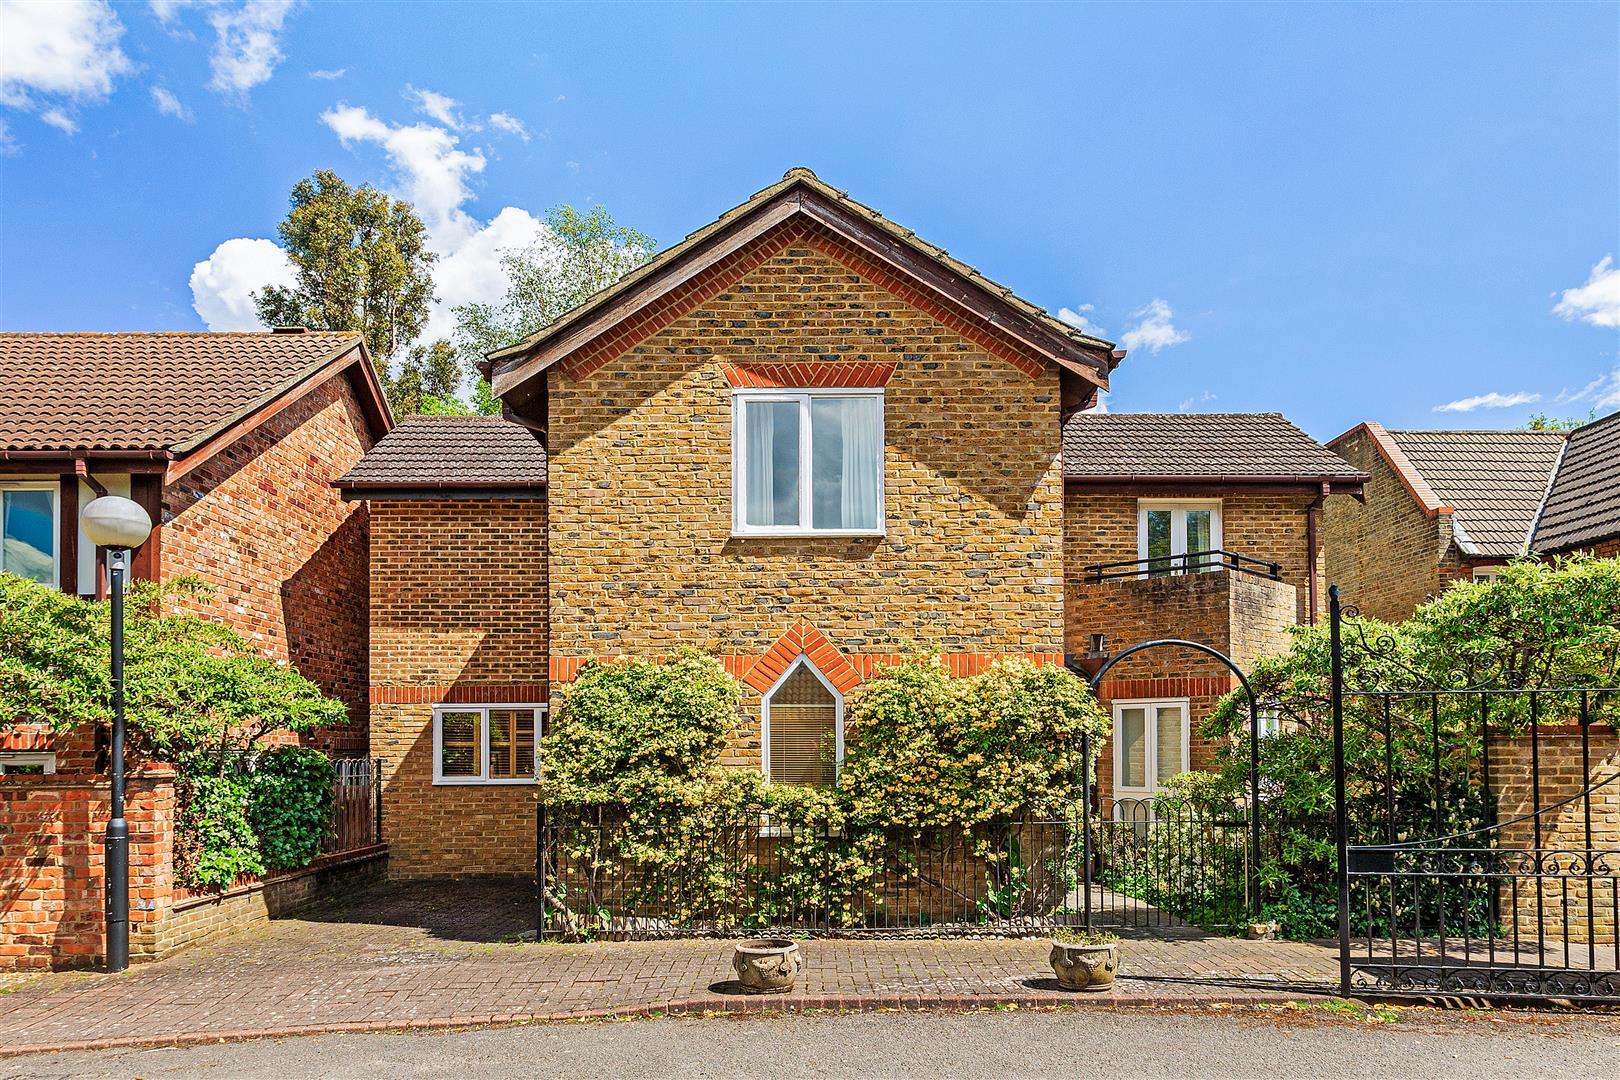 Grange Park Place, West Wimbledon - Andrew Scott Robertson